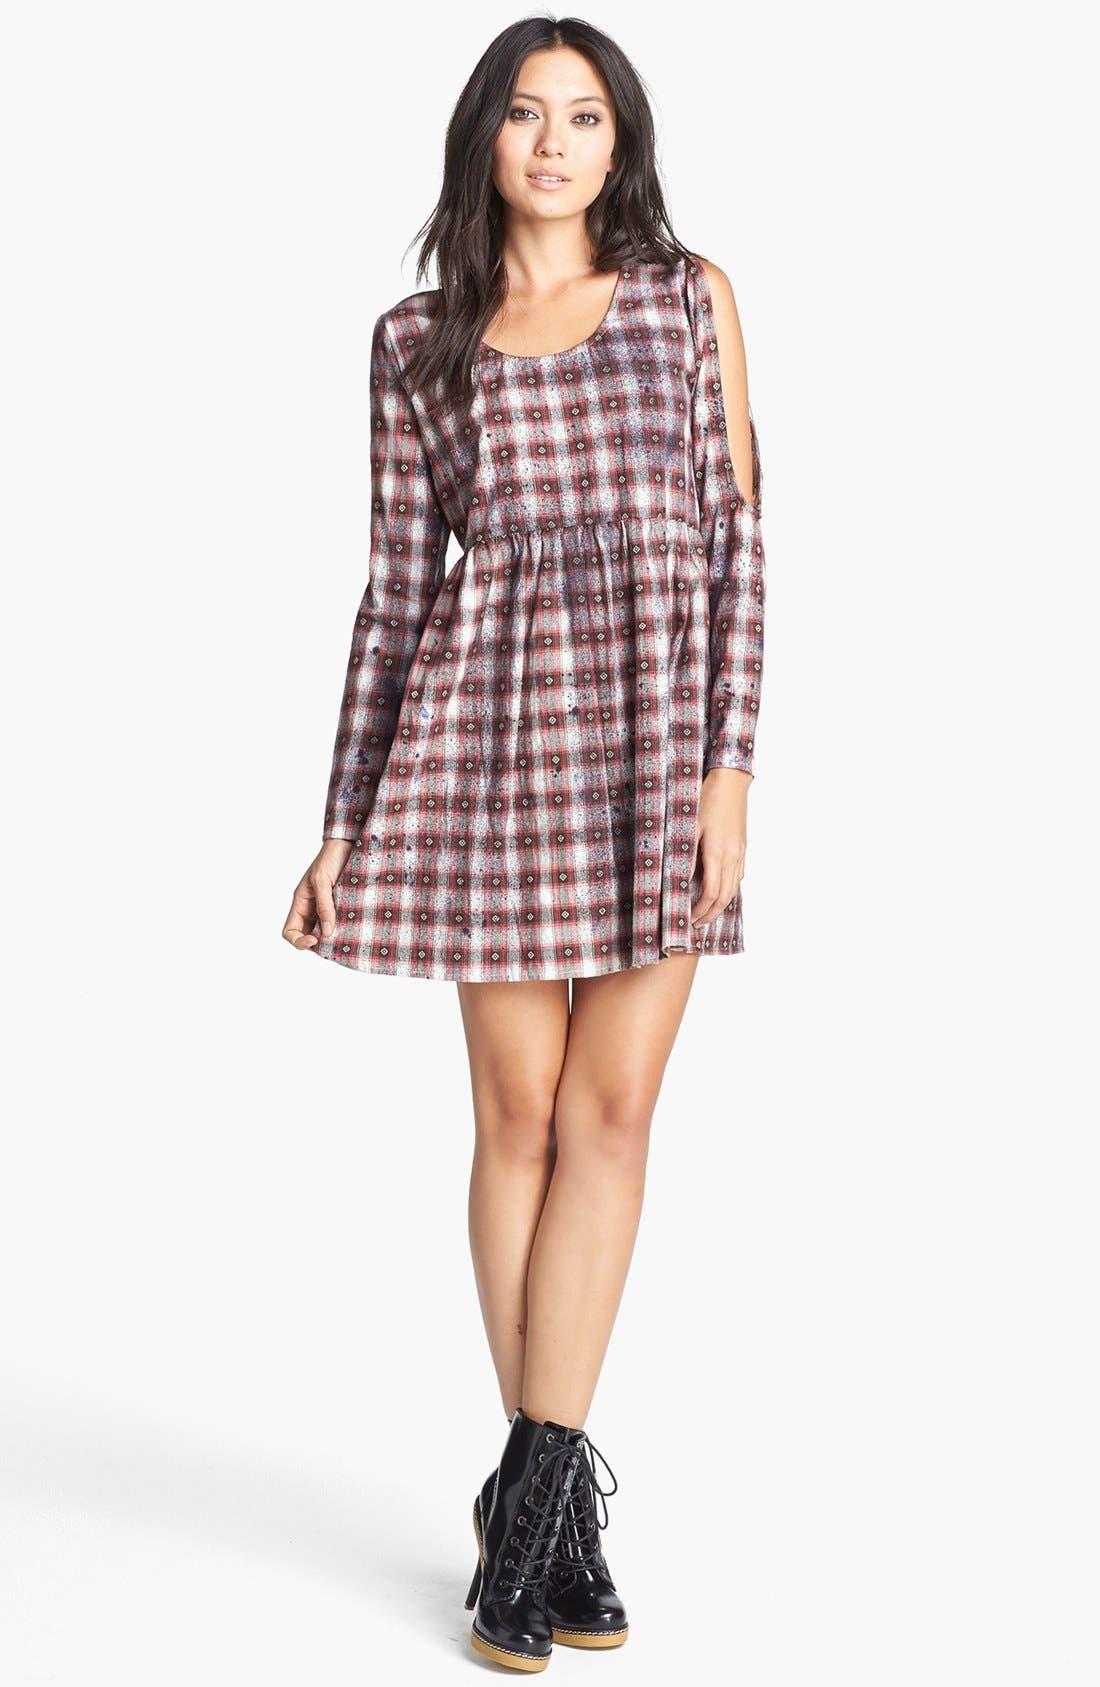 Alternate Image 1 Selected - MINKPINK 'Easy Going' Print Babydoll Dress